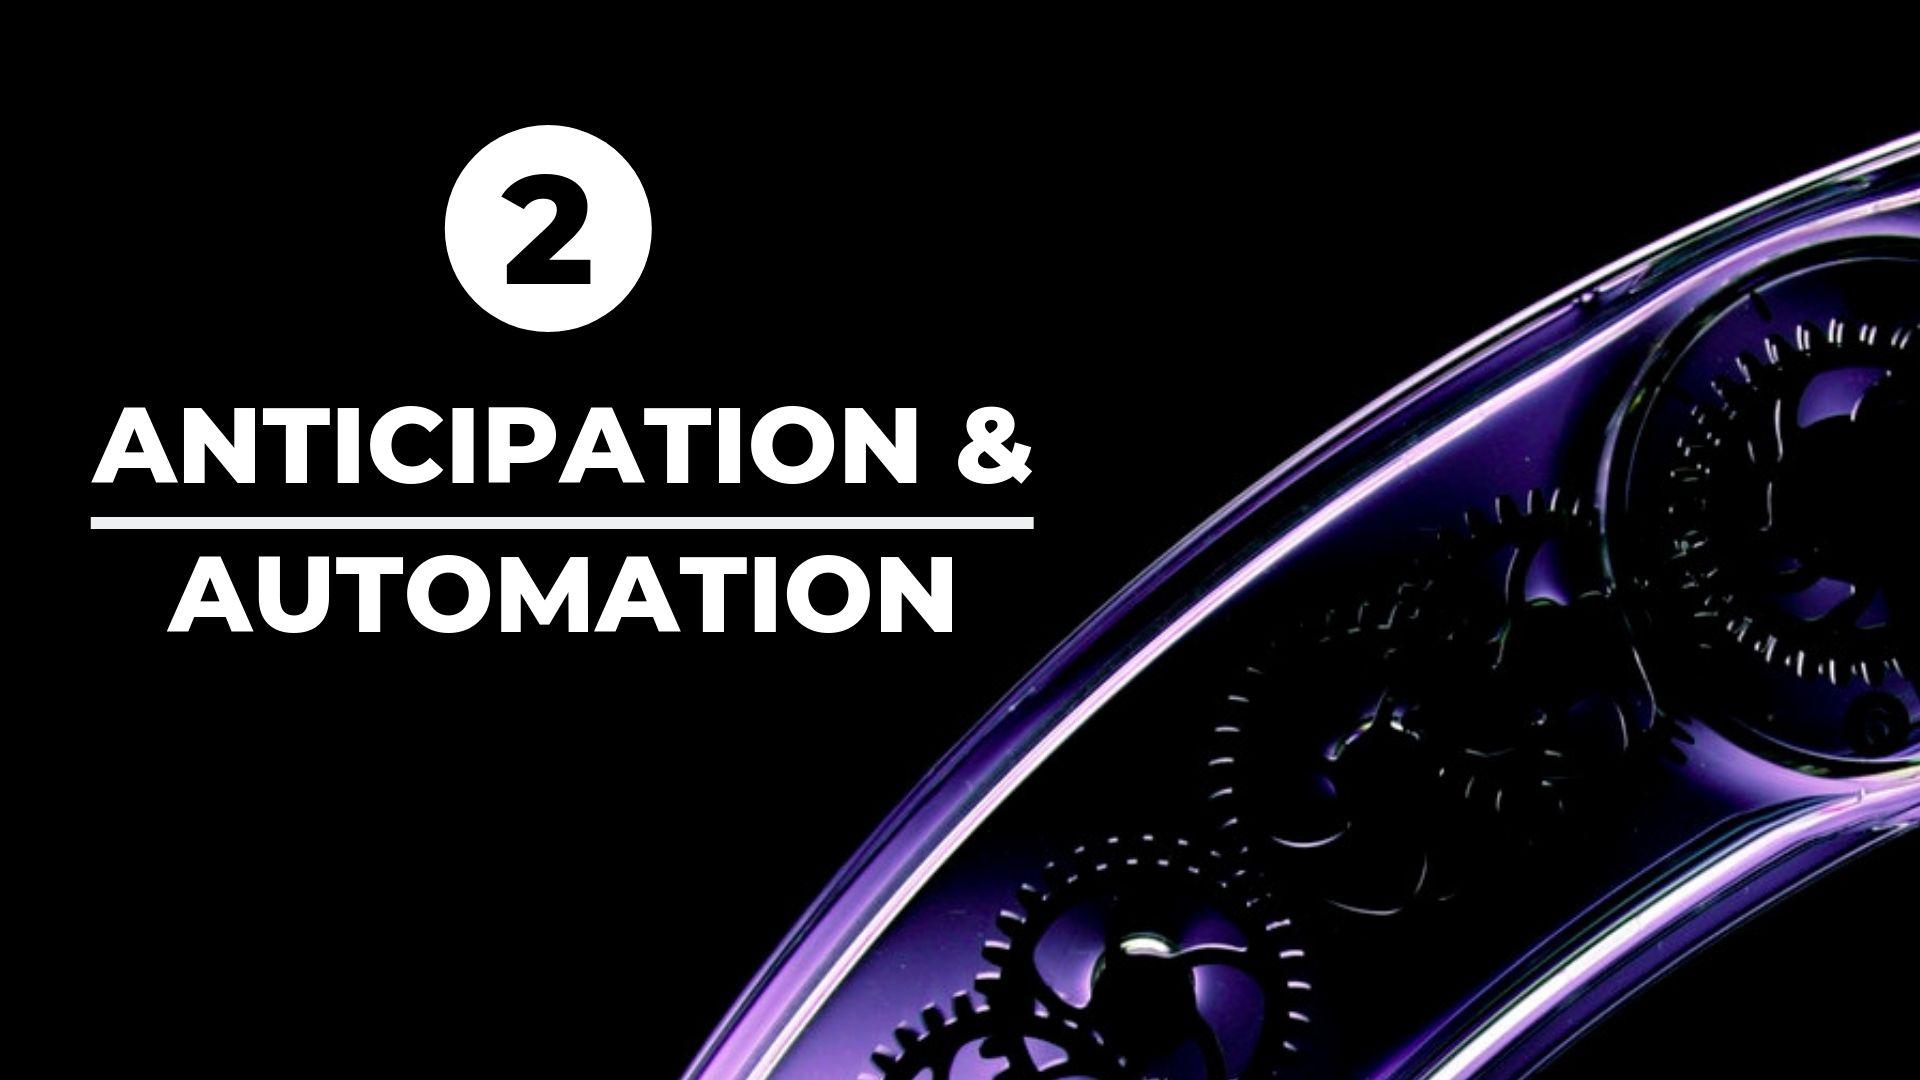 Anticipation & Automation